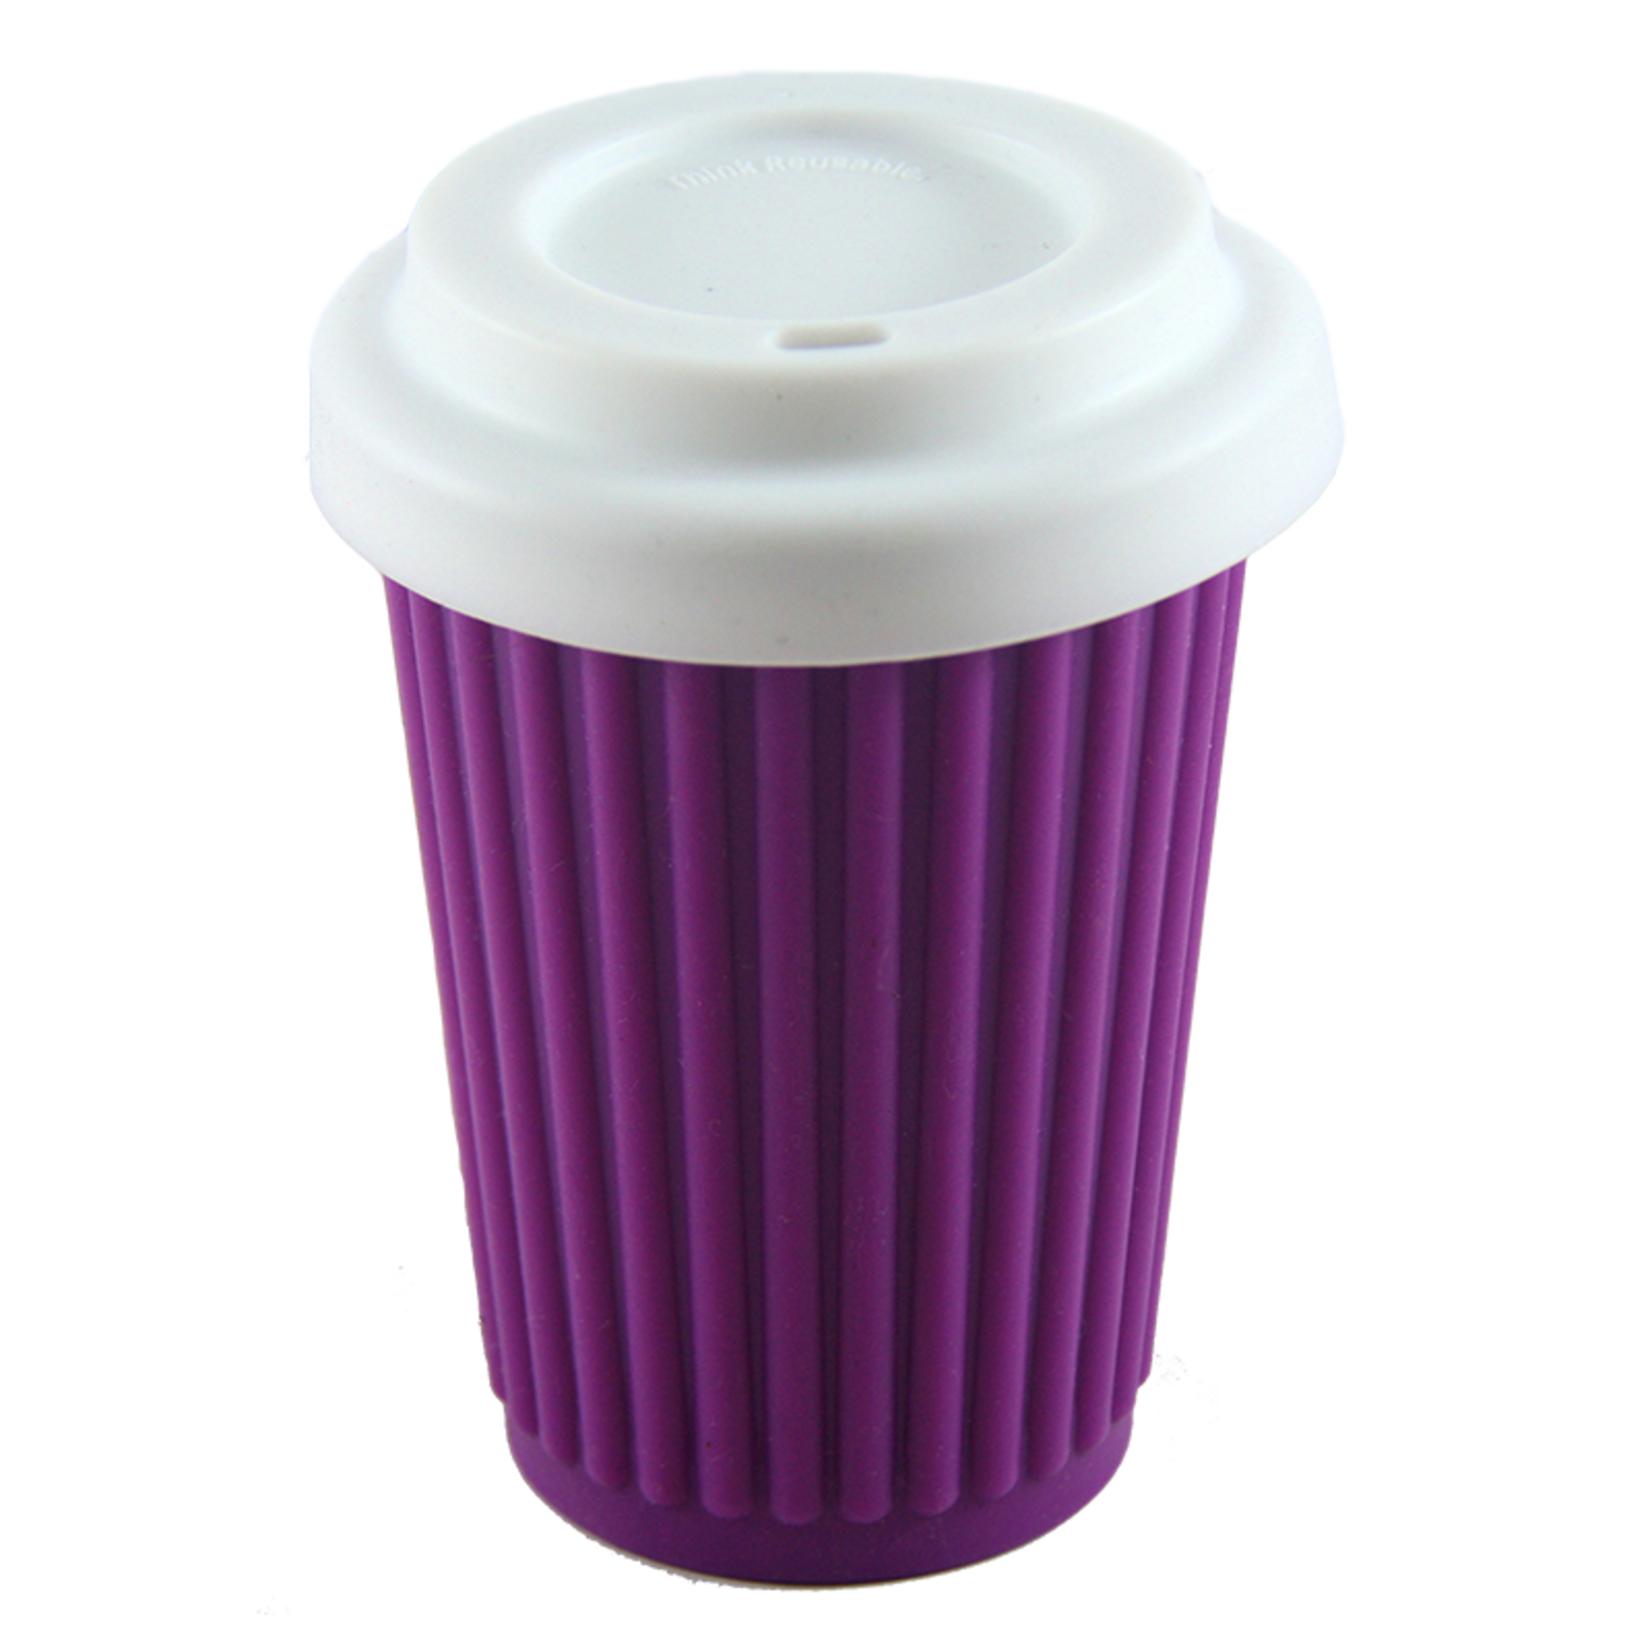 Onya Onya BYO Coffee Cup